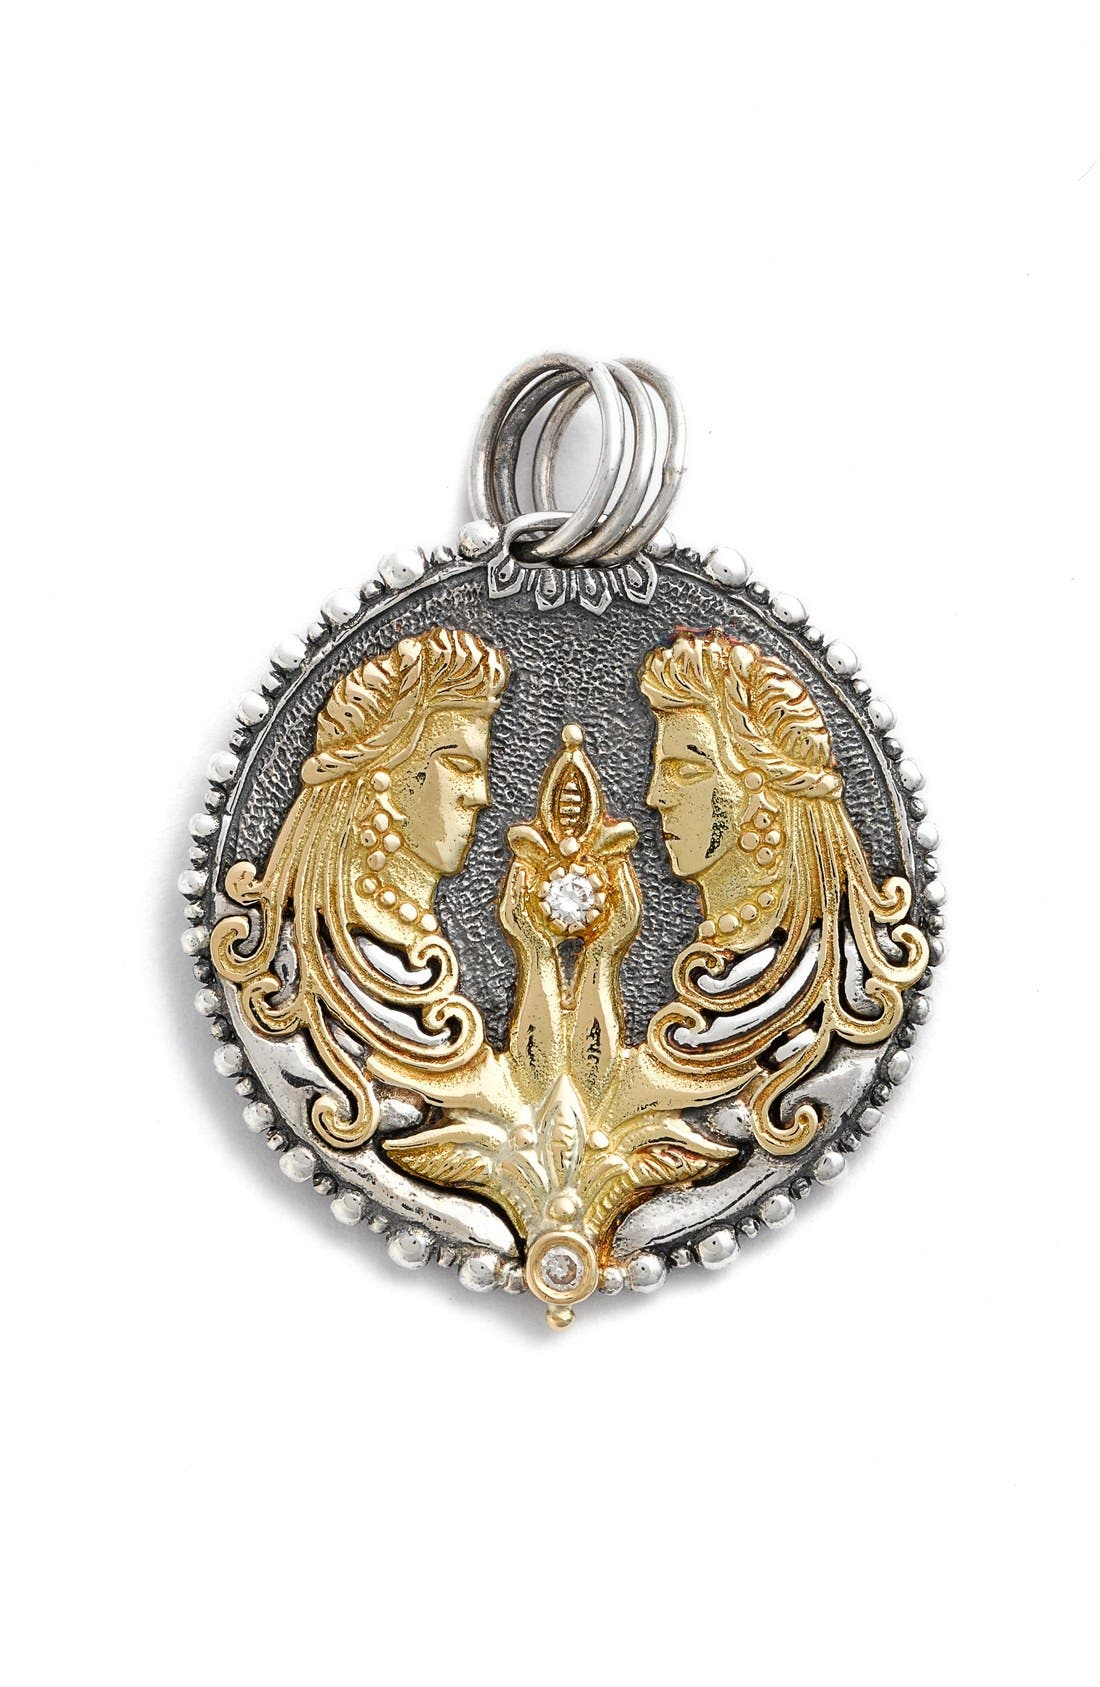 Konstantino zodiac pendant gemini silver gold modesens konstantino zodiac pendant gemini silver gold aloadofball Gallery